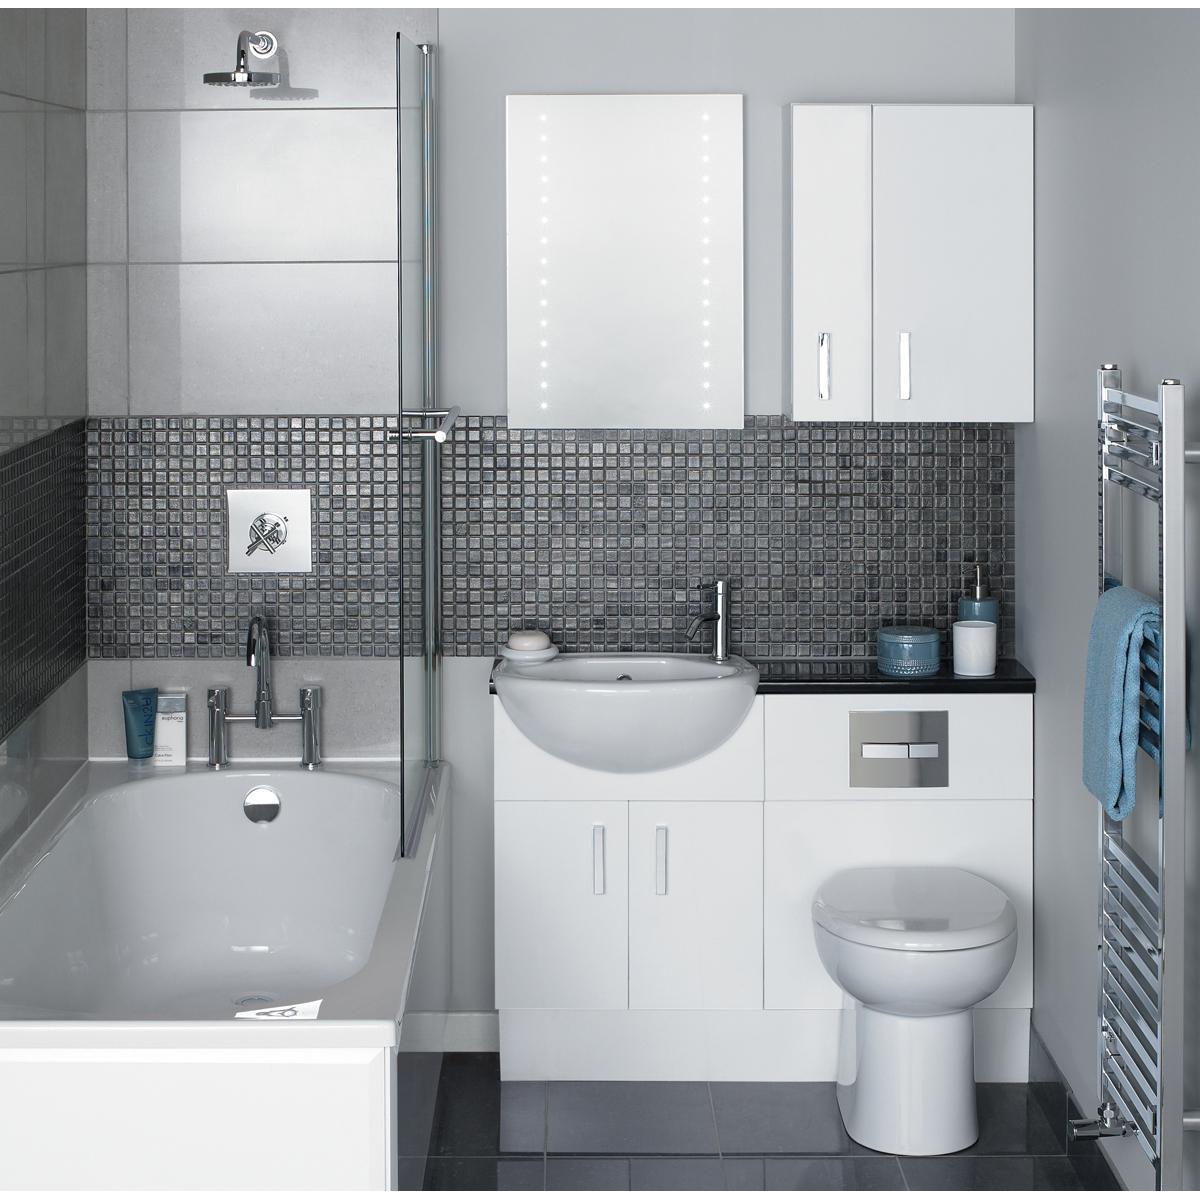 بالصور تصميم حمامات , اجمل ديكورات الحمامات 3285 5